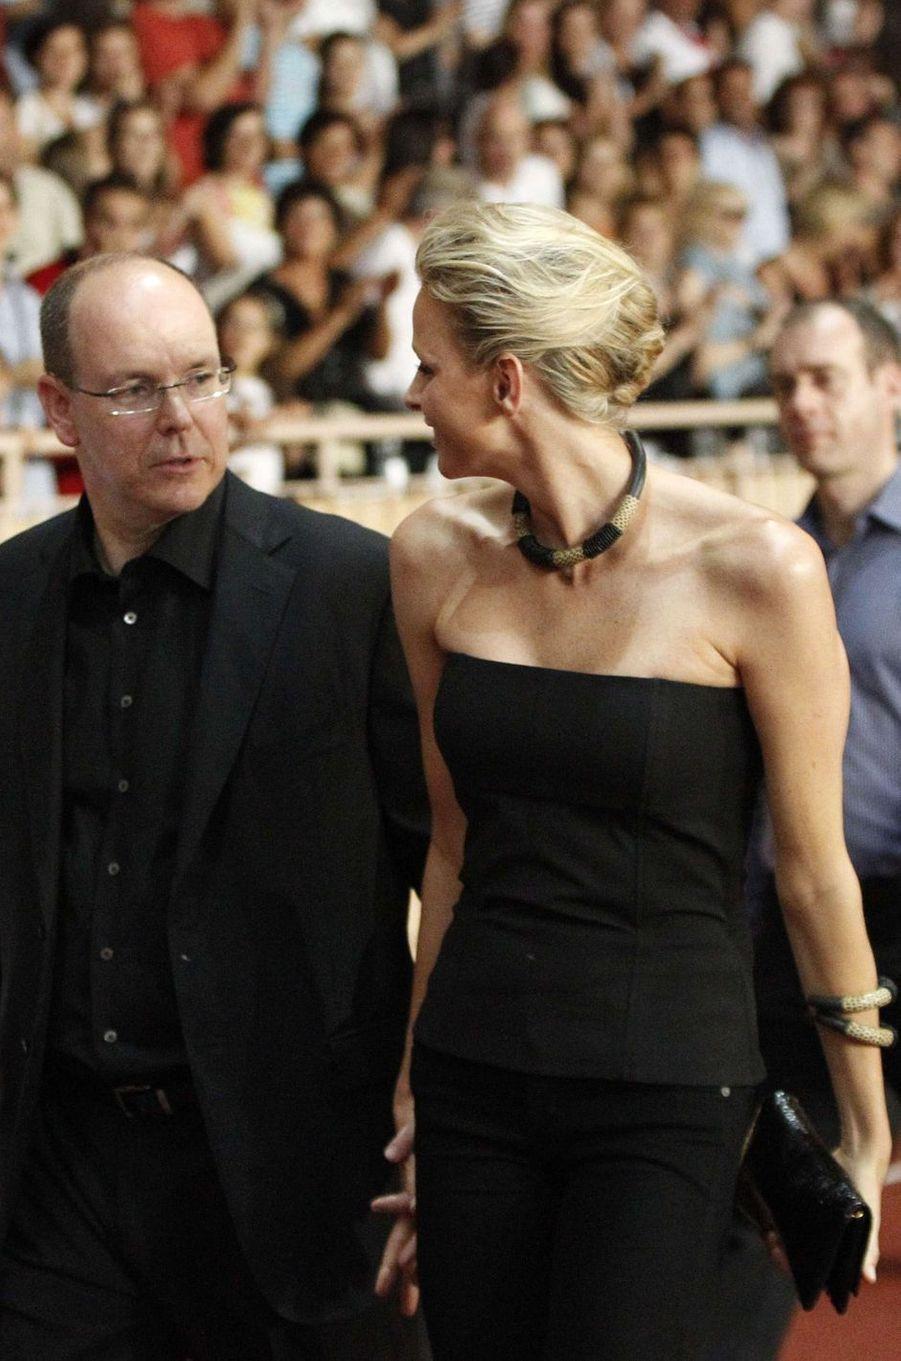 Le prince Albert II de Monaco et Charlène Wittstock au stade Louis-II à Monaco, le 30 juin 2011